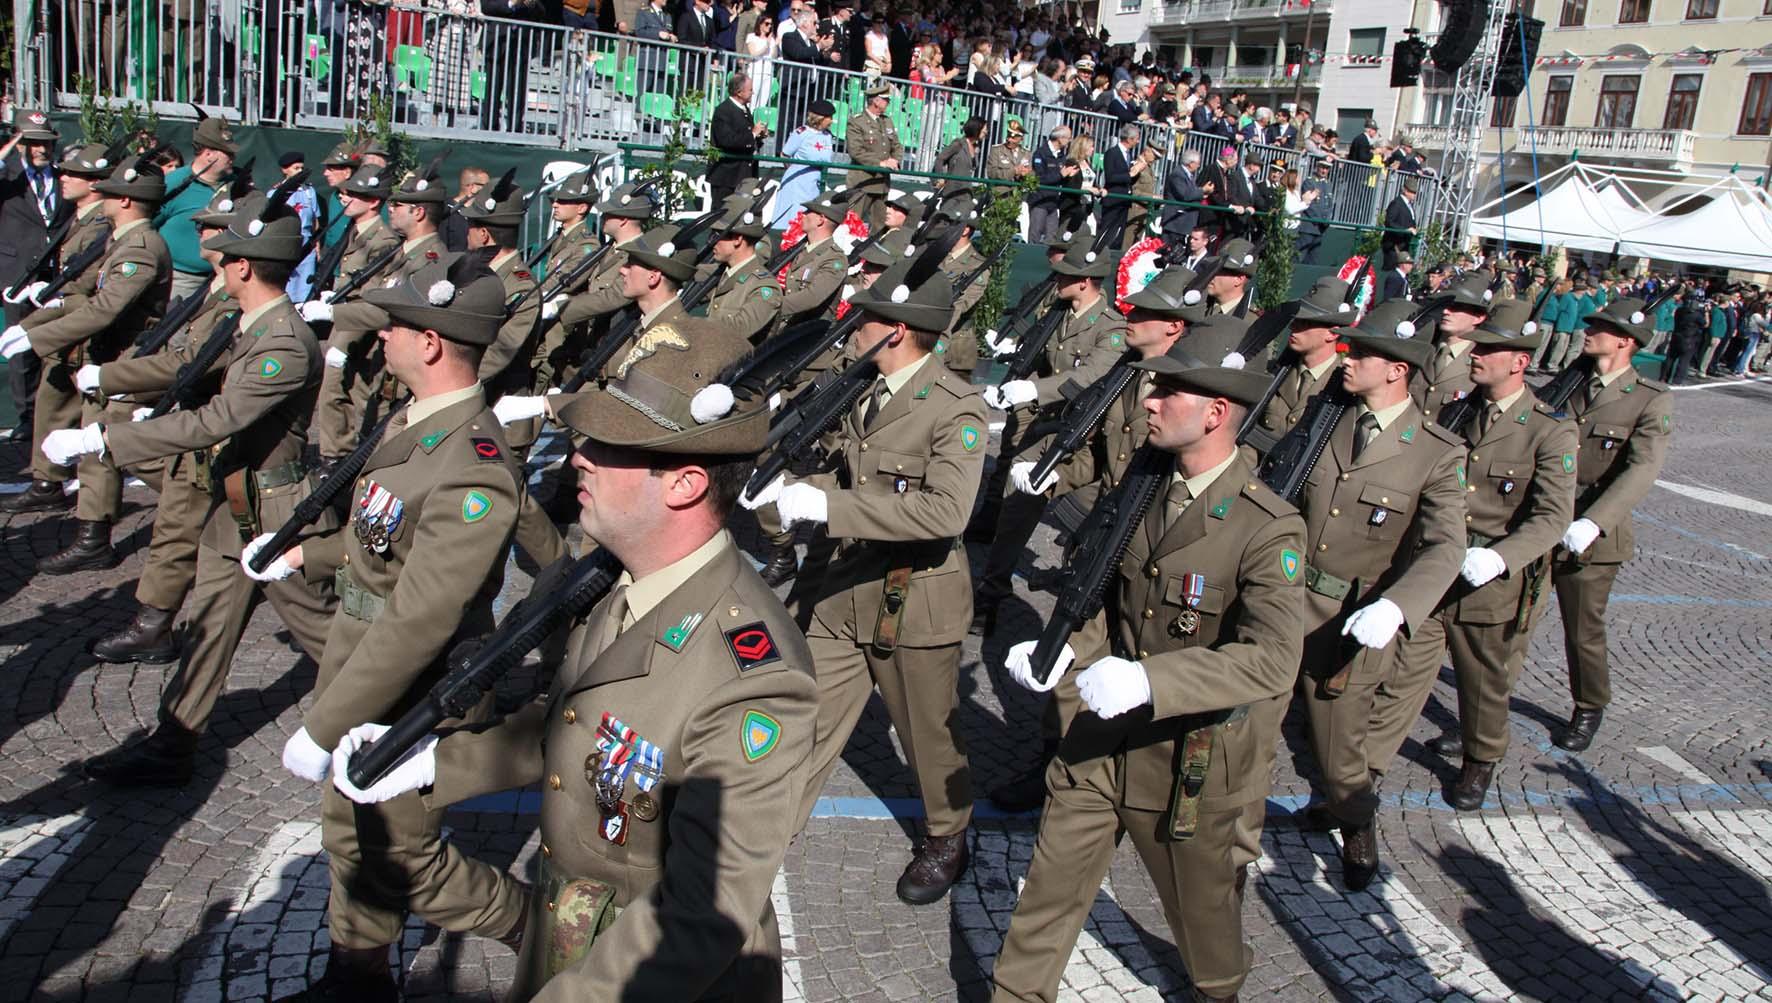 90 adunata alpini treviso 2017 sfilata militari